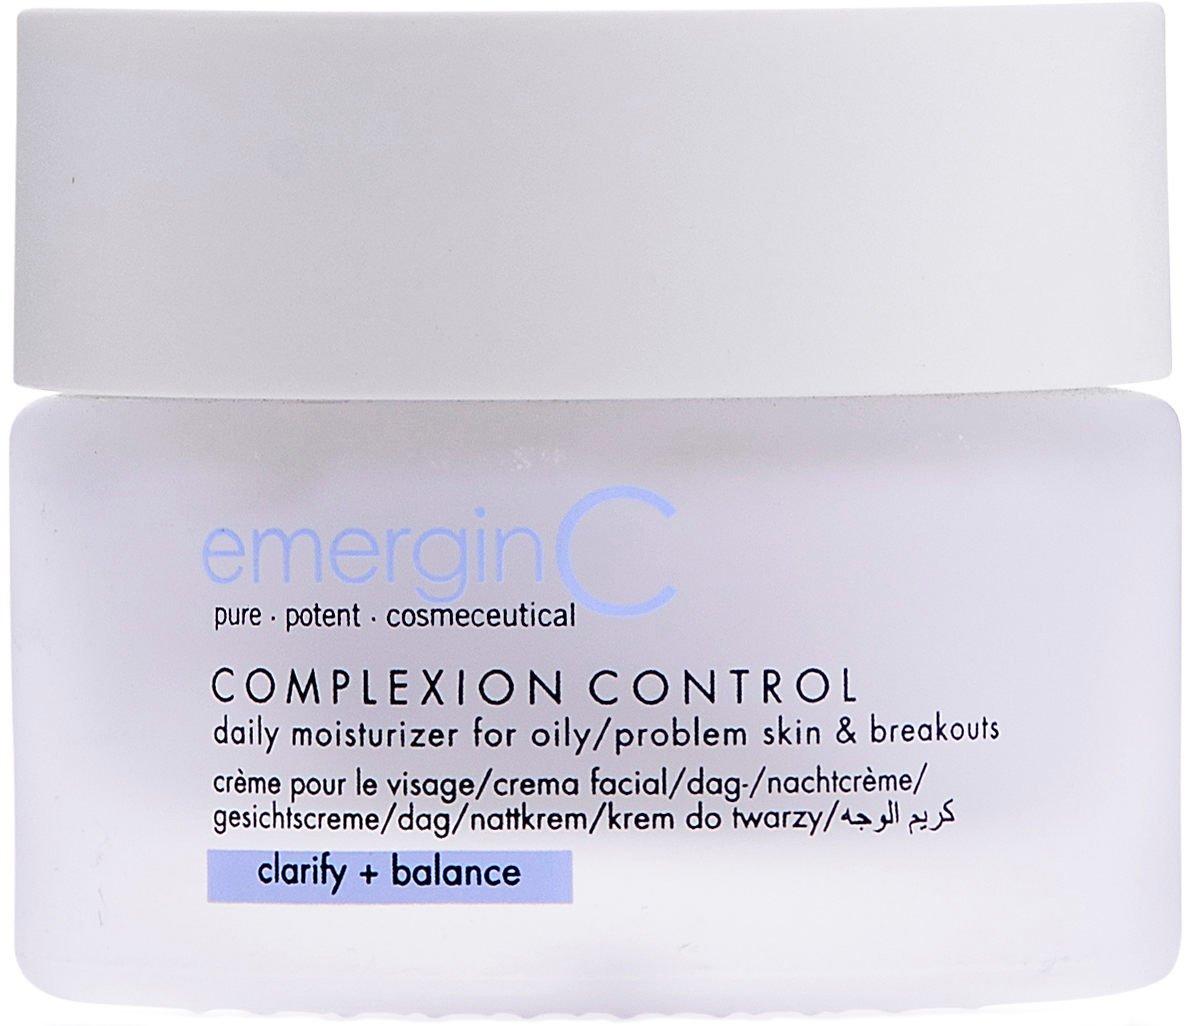 emerginC Complexion Control 50ml/1.7oz avon solutions nurtura replenishing cream